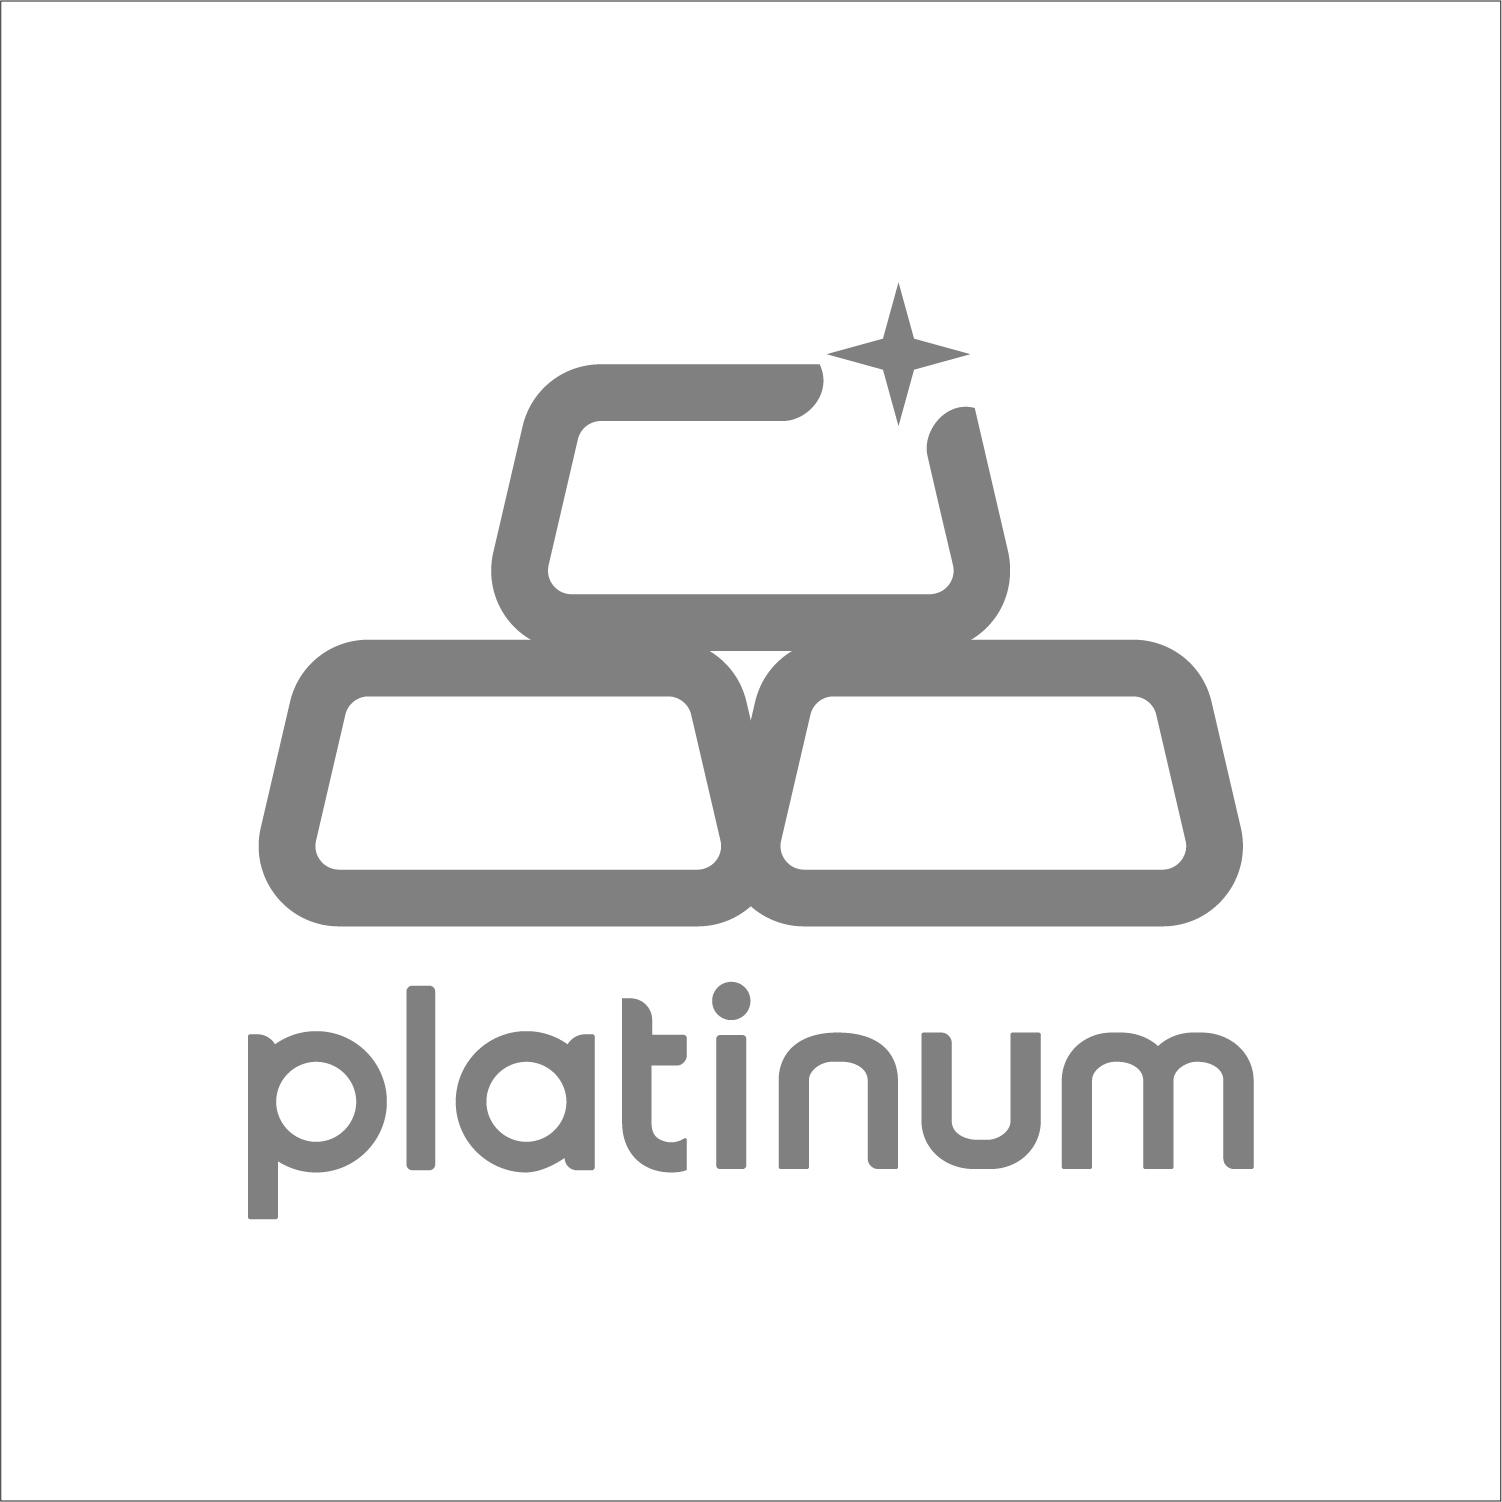 platinum-final.jpg